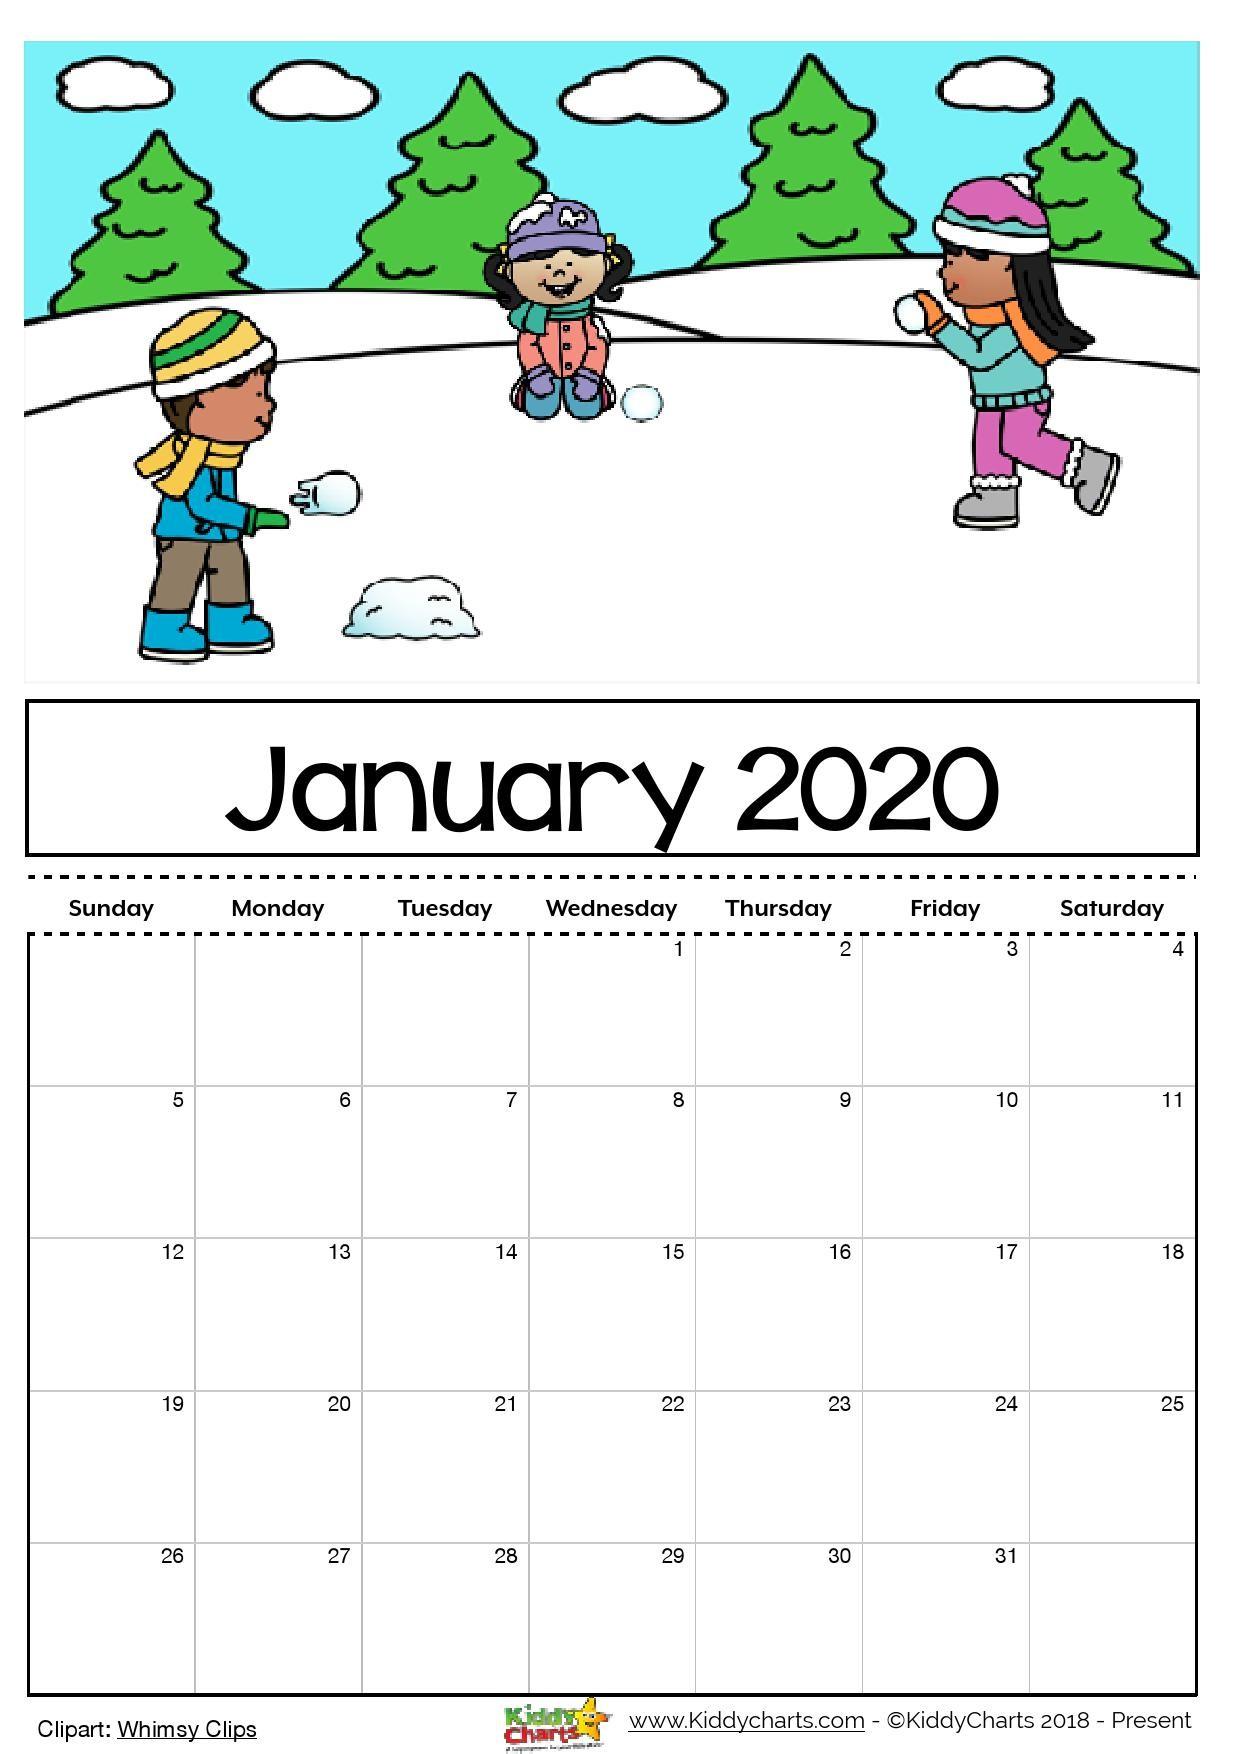 Printable Calendar for January 2020 Free Printable 2020 Calendar for Kids Including An